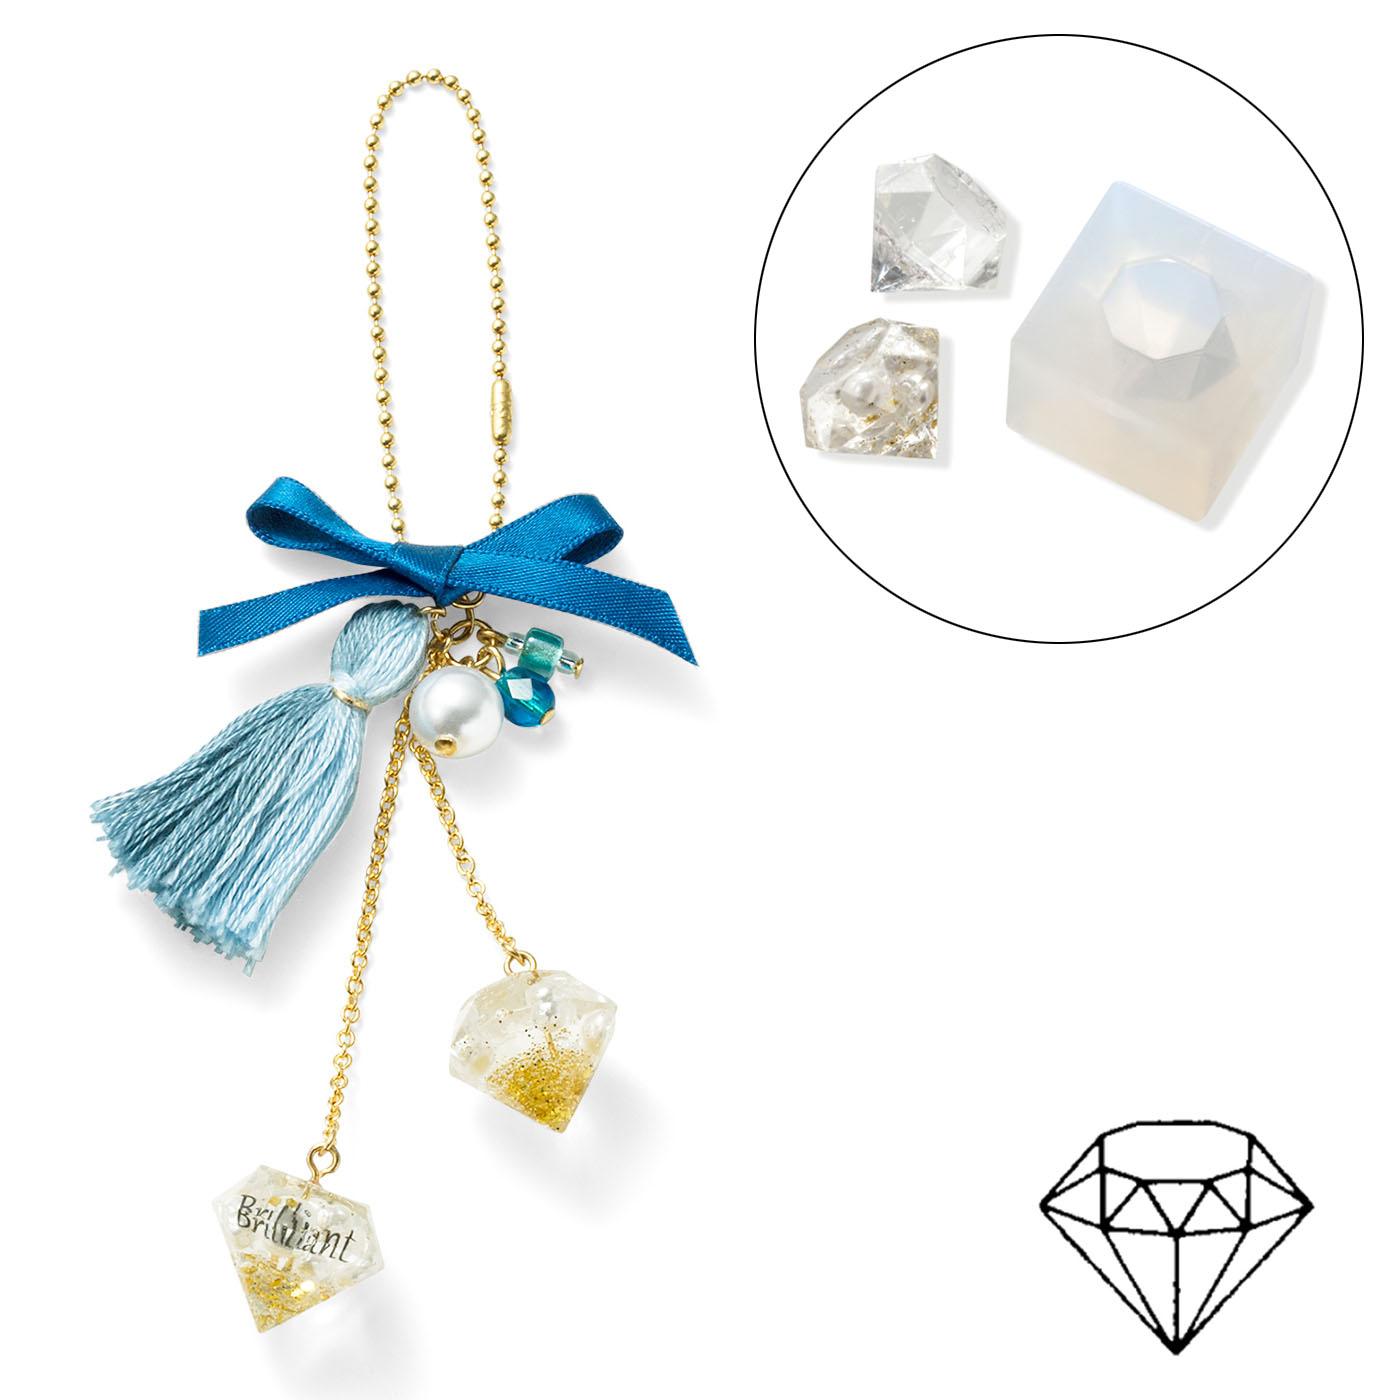 diamond〈ダイアモンド形〉